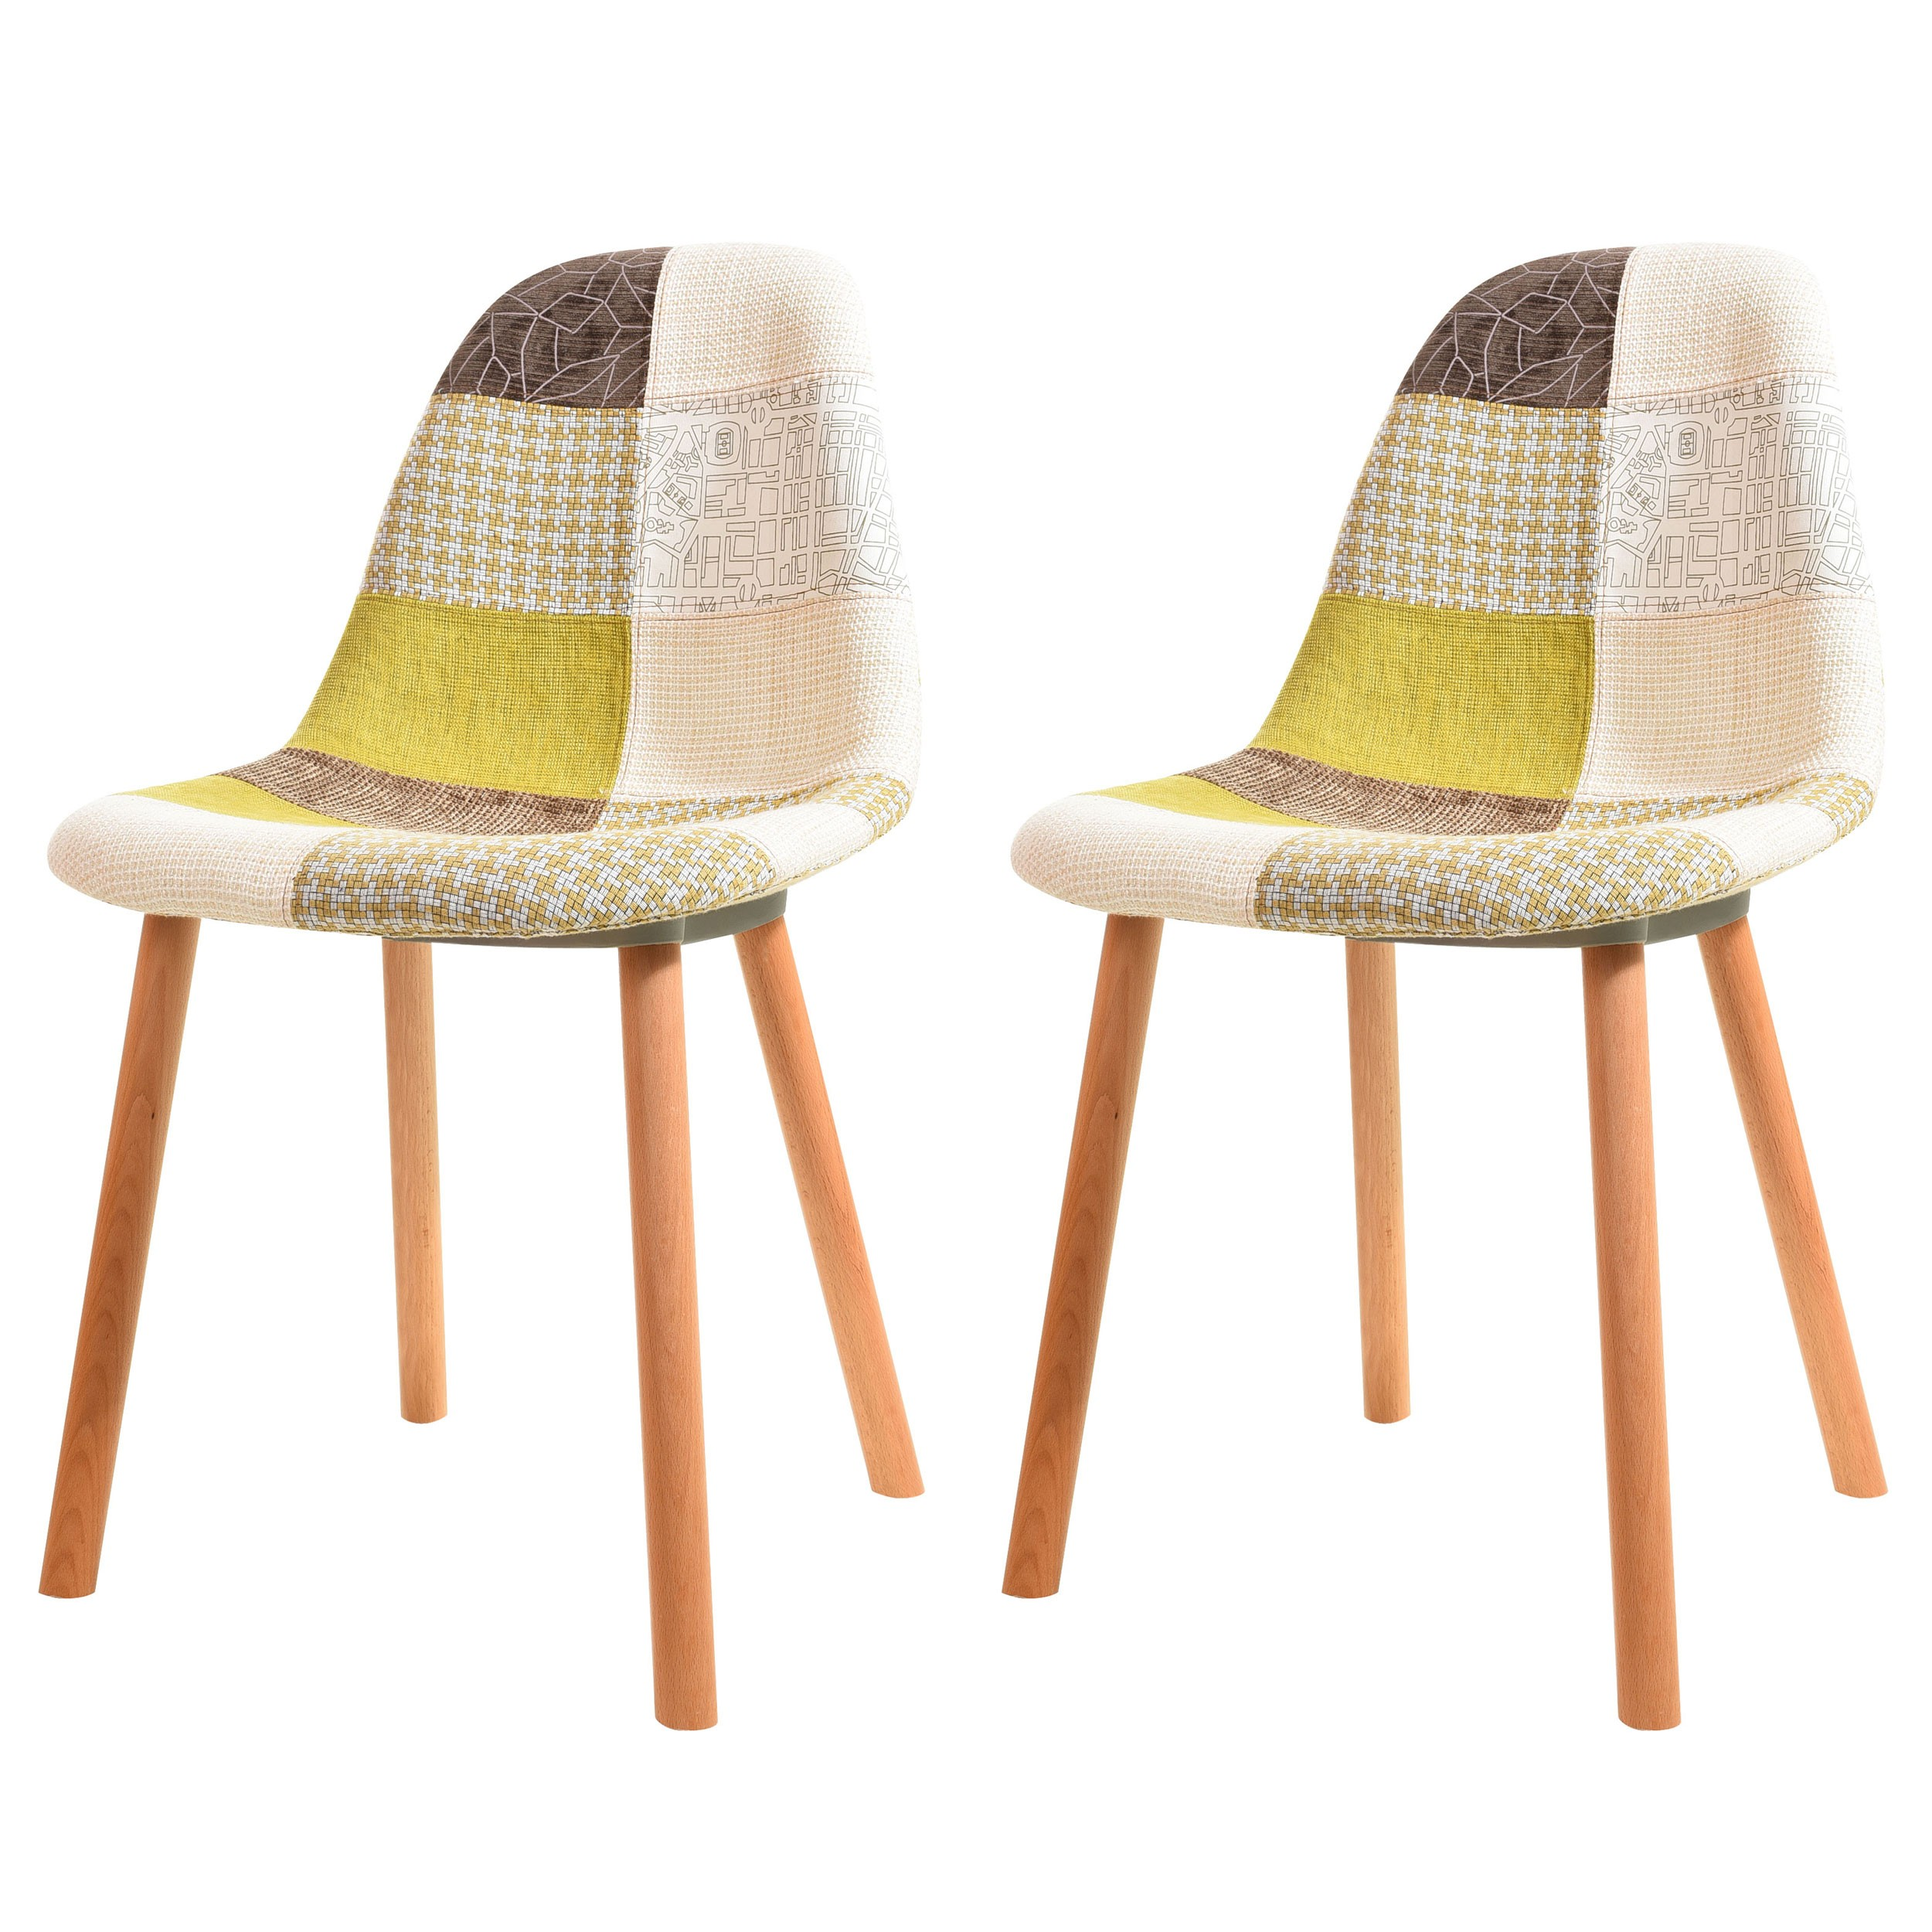 acheter chaise scandinave tissu vert - Chaise Scandinave Beige